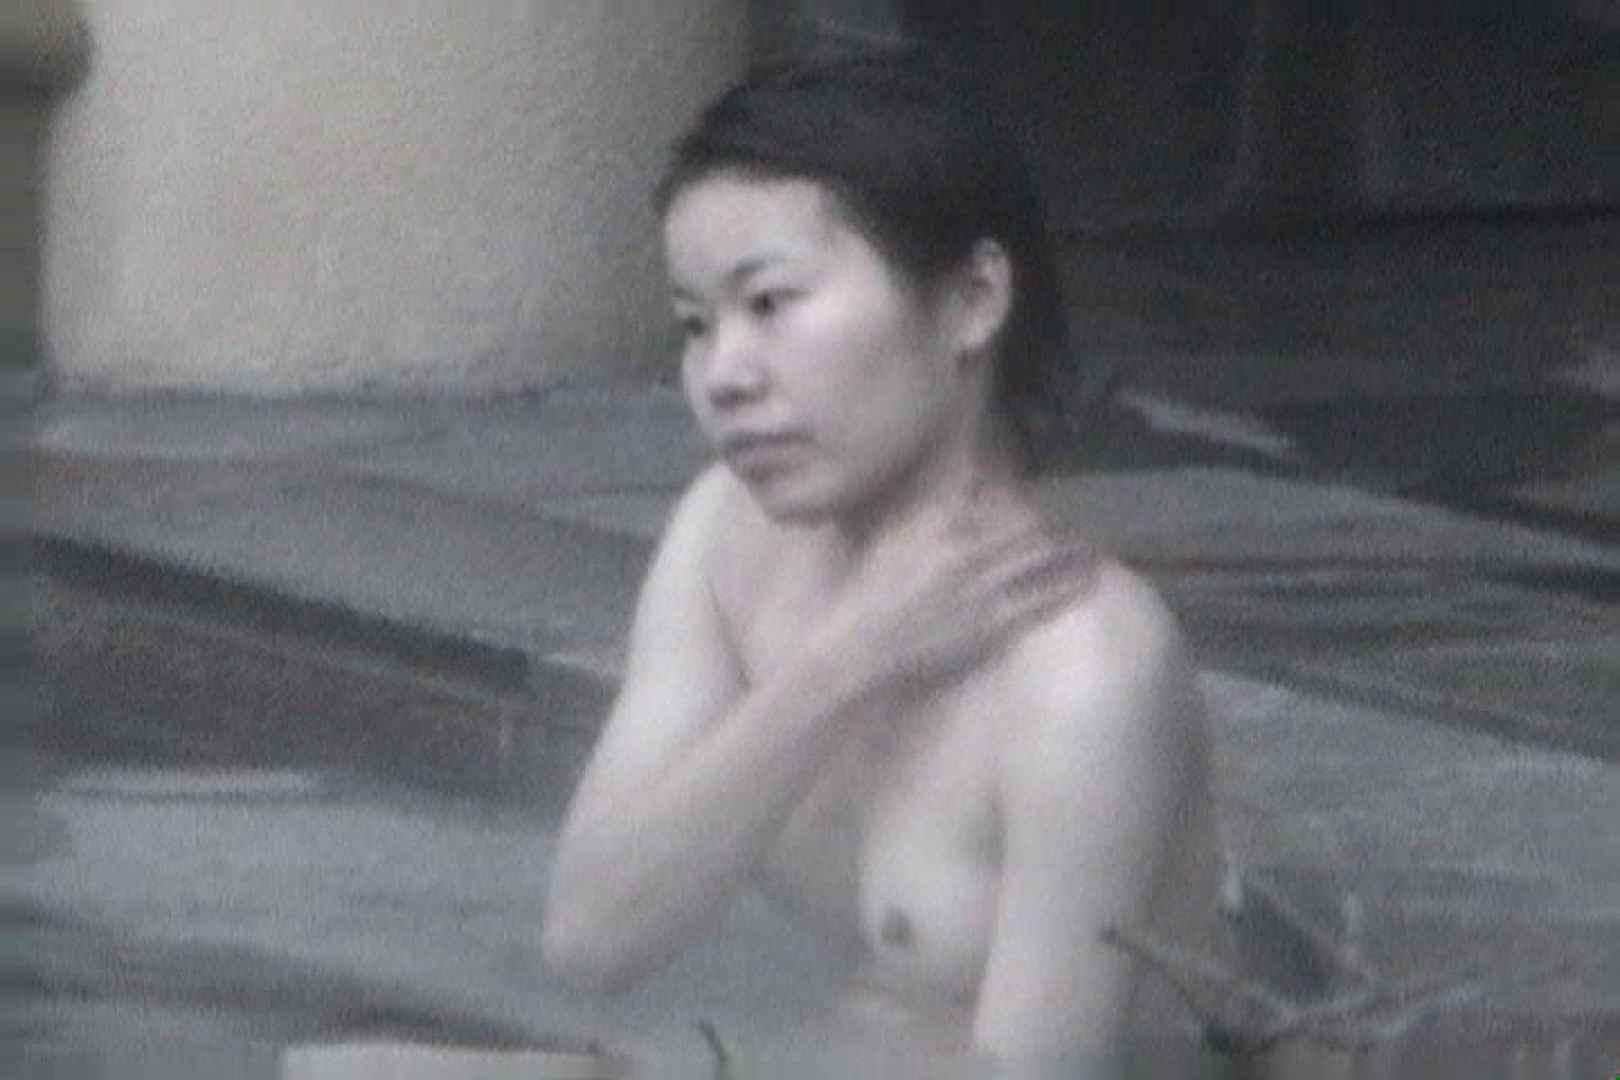 Aquaな露天風呂Vol.556 露天風呂編 | 盗撮シリーズ  99PIX 69